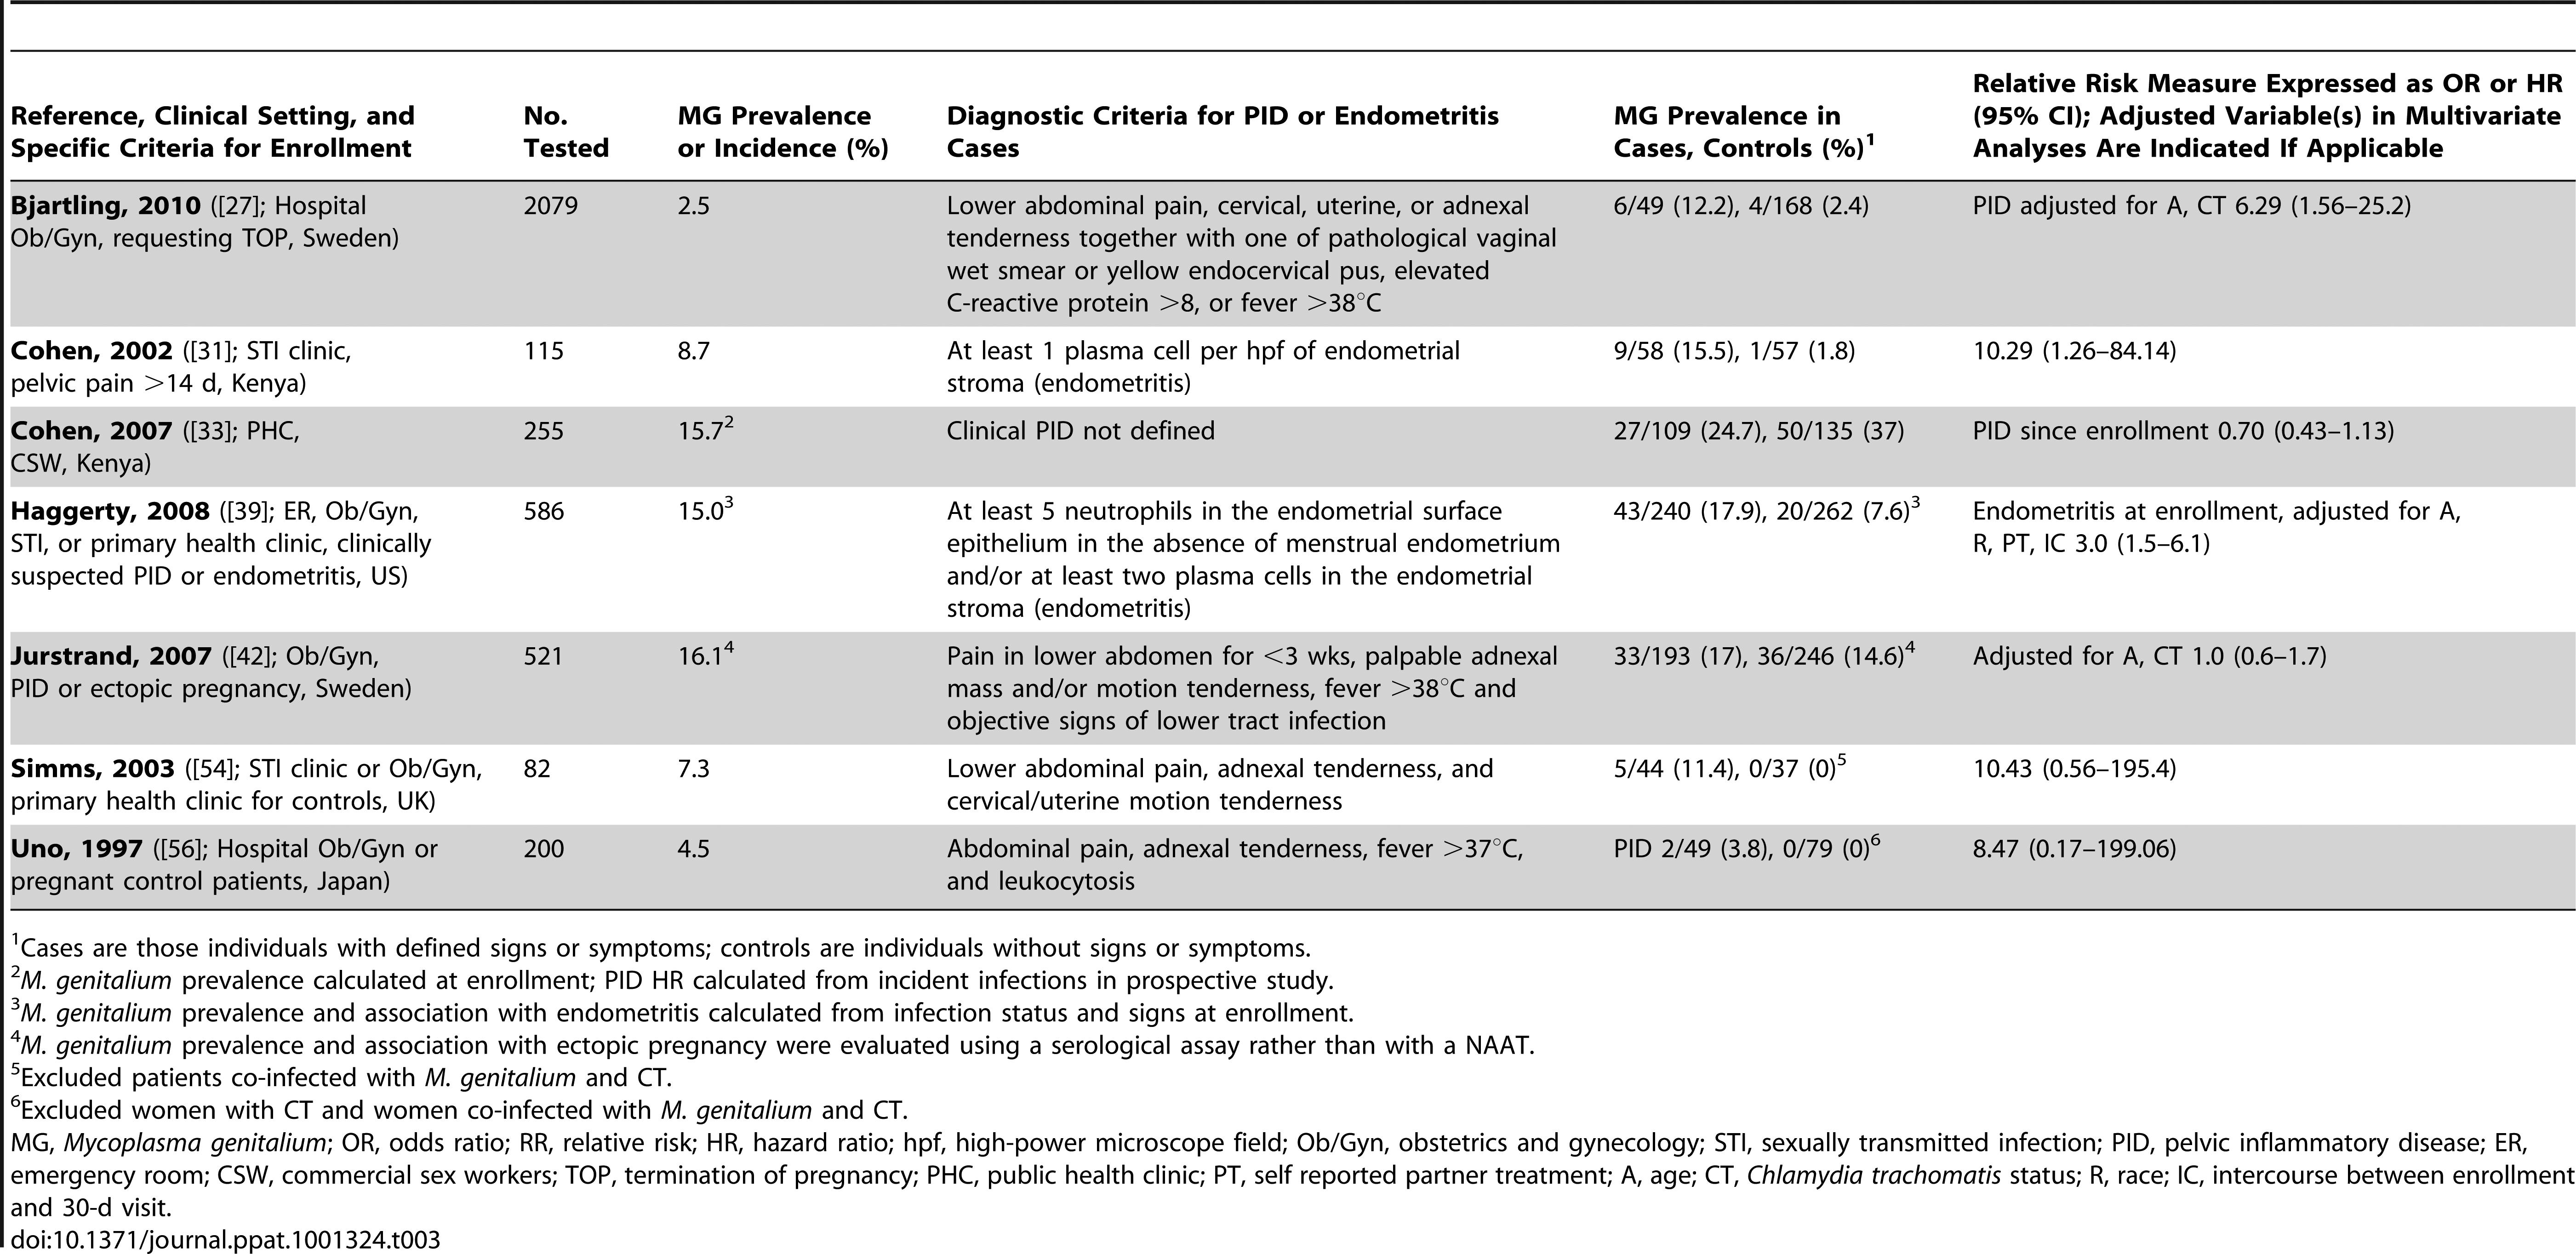 Characteristics of published studies evaluating the associations of <i>M. genitalium</i> with pelvic inflammatory disease.